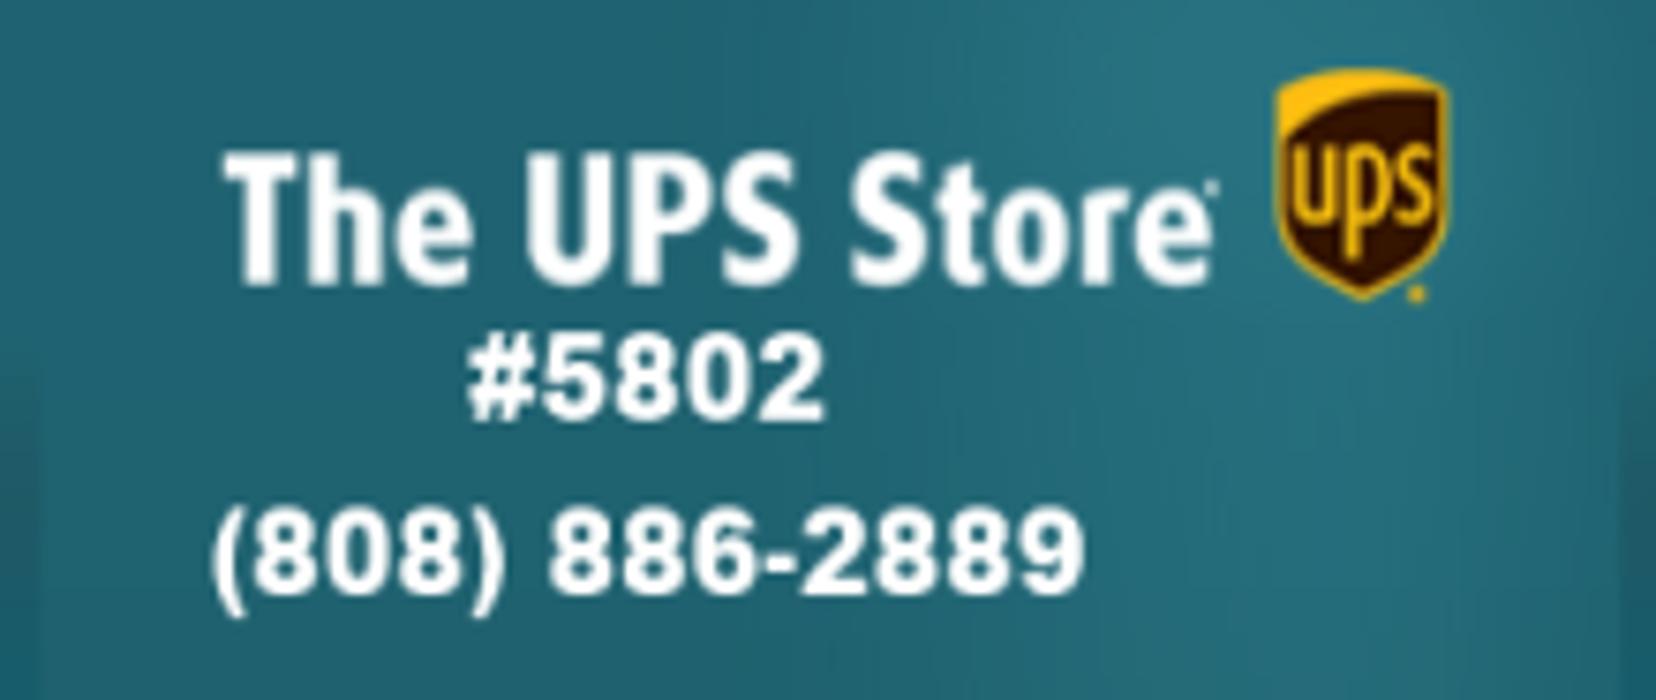 The Ups Store - Waikoloa, HI